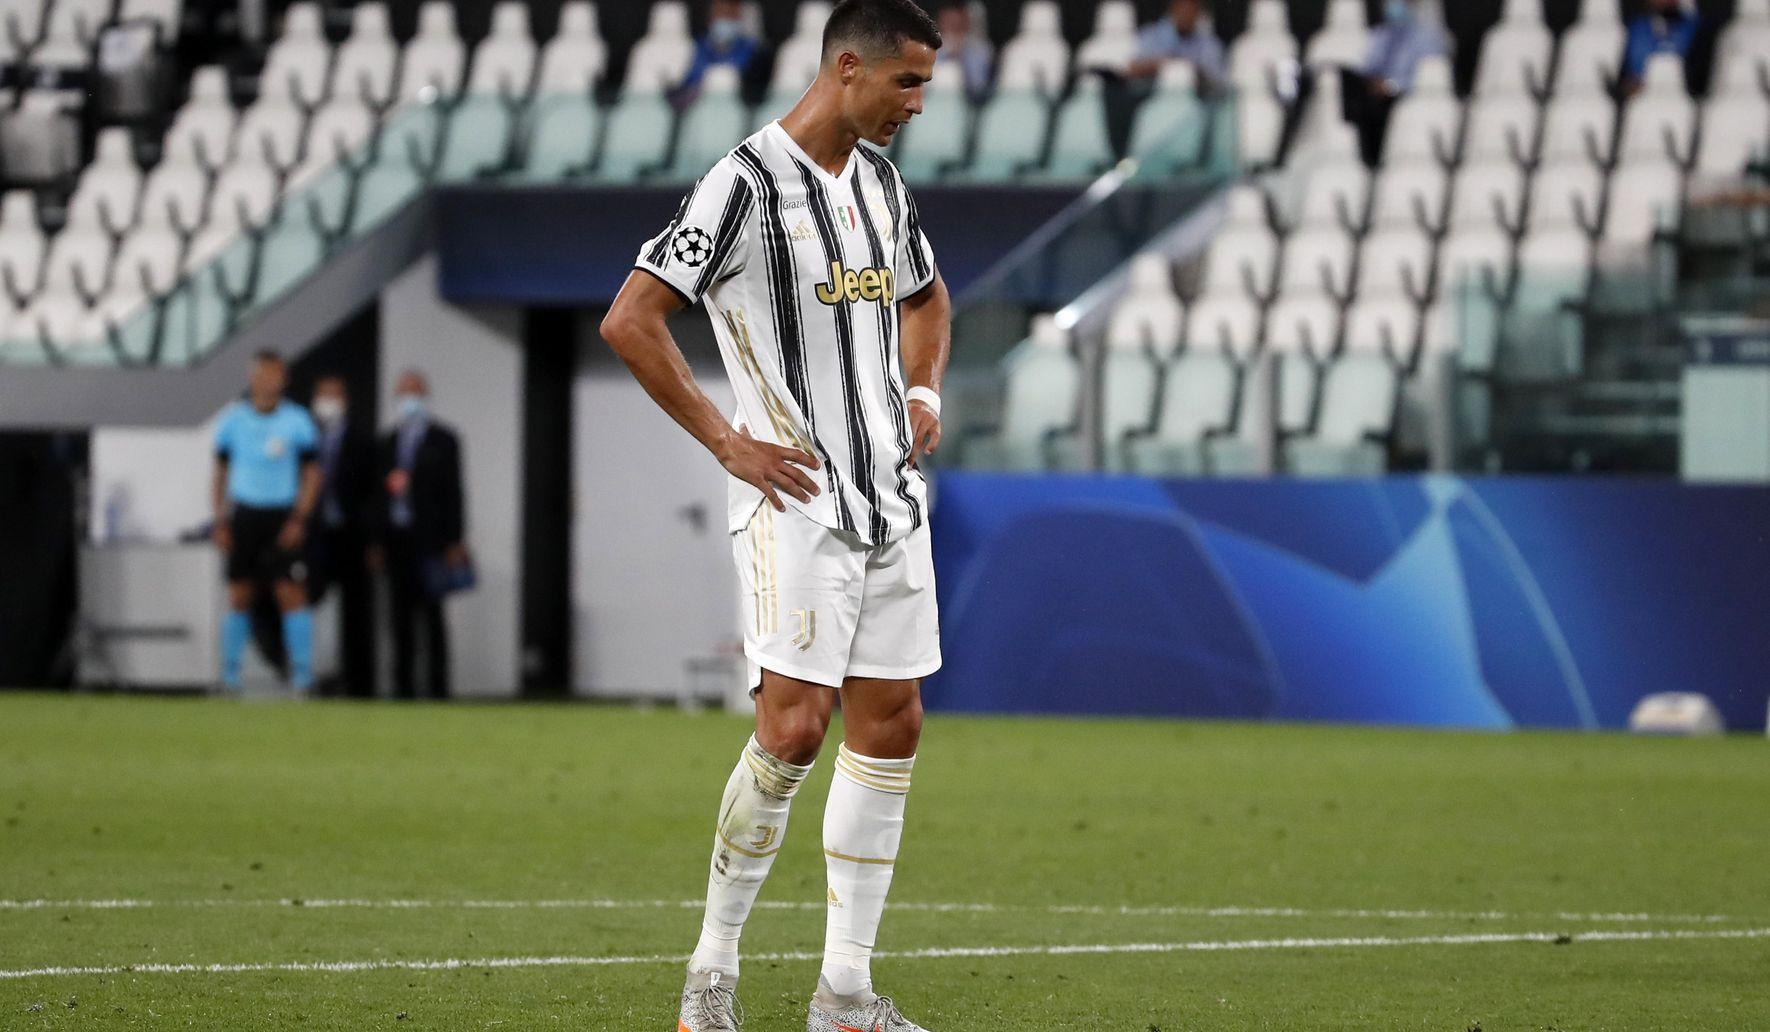 Italy_soccer_champions_league_20130_c0-229-5472-3419_s1770x1032